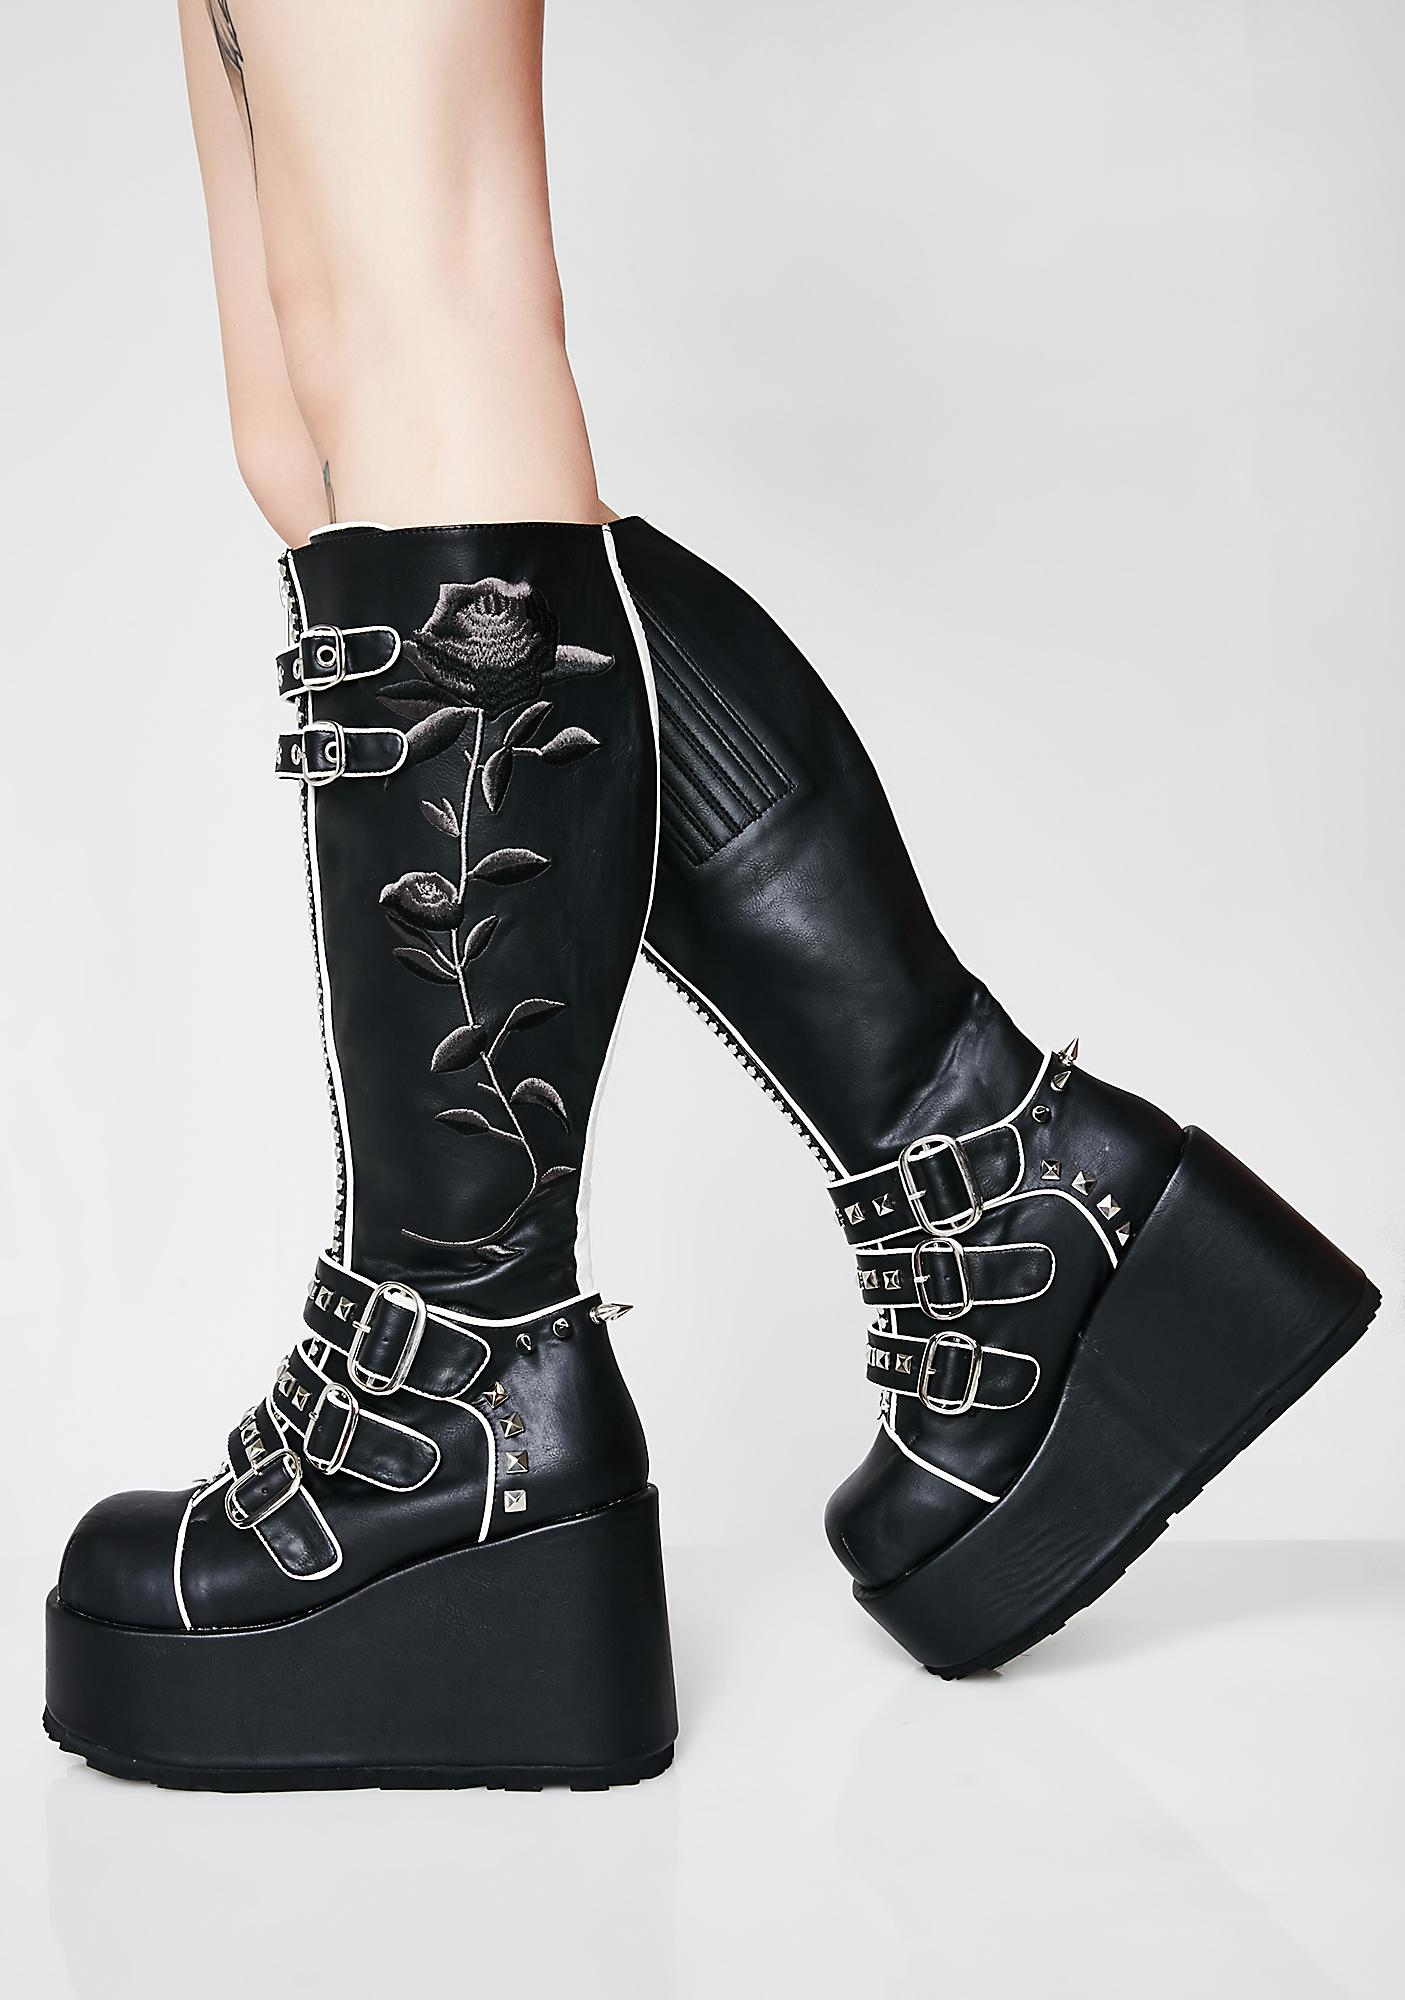 Demonia Slaytanic Platform Rose Boots